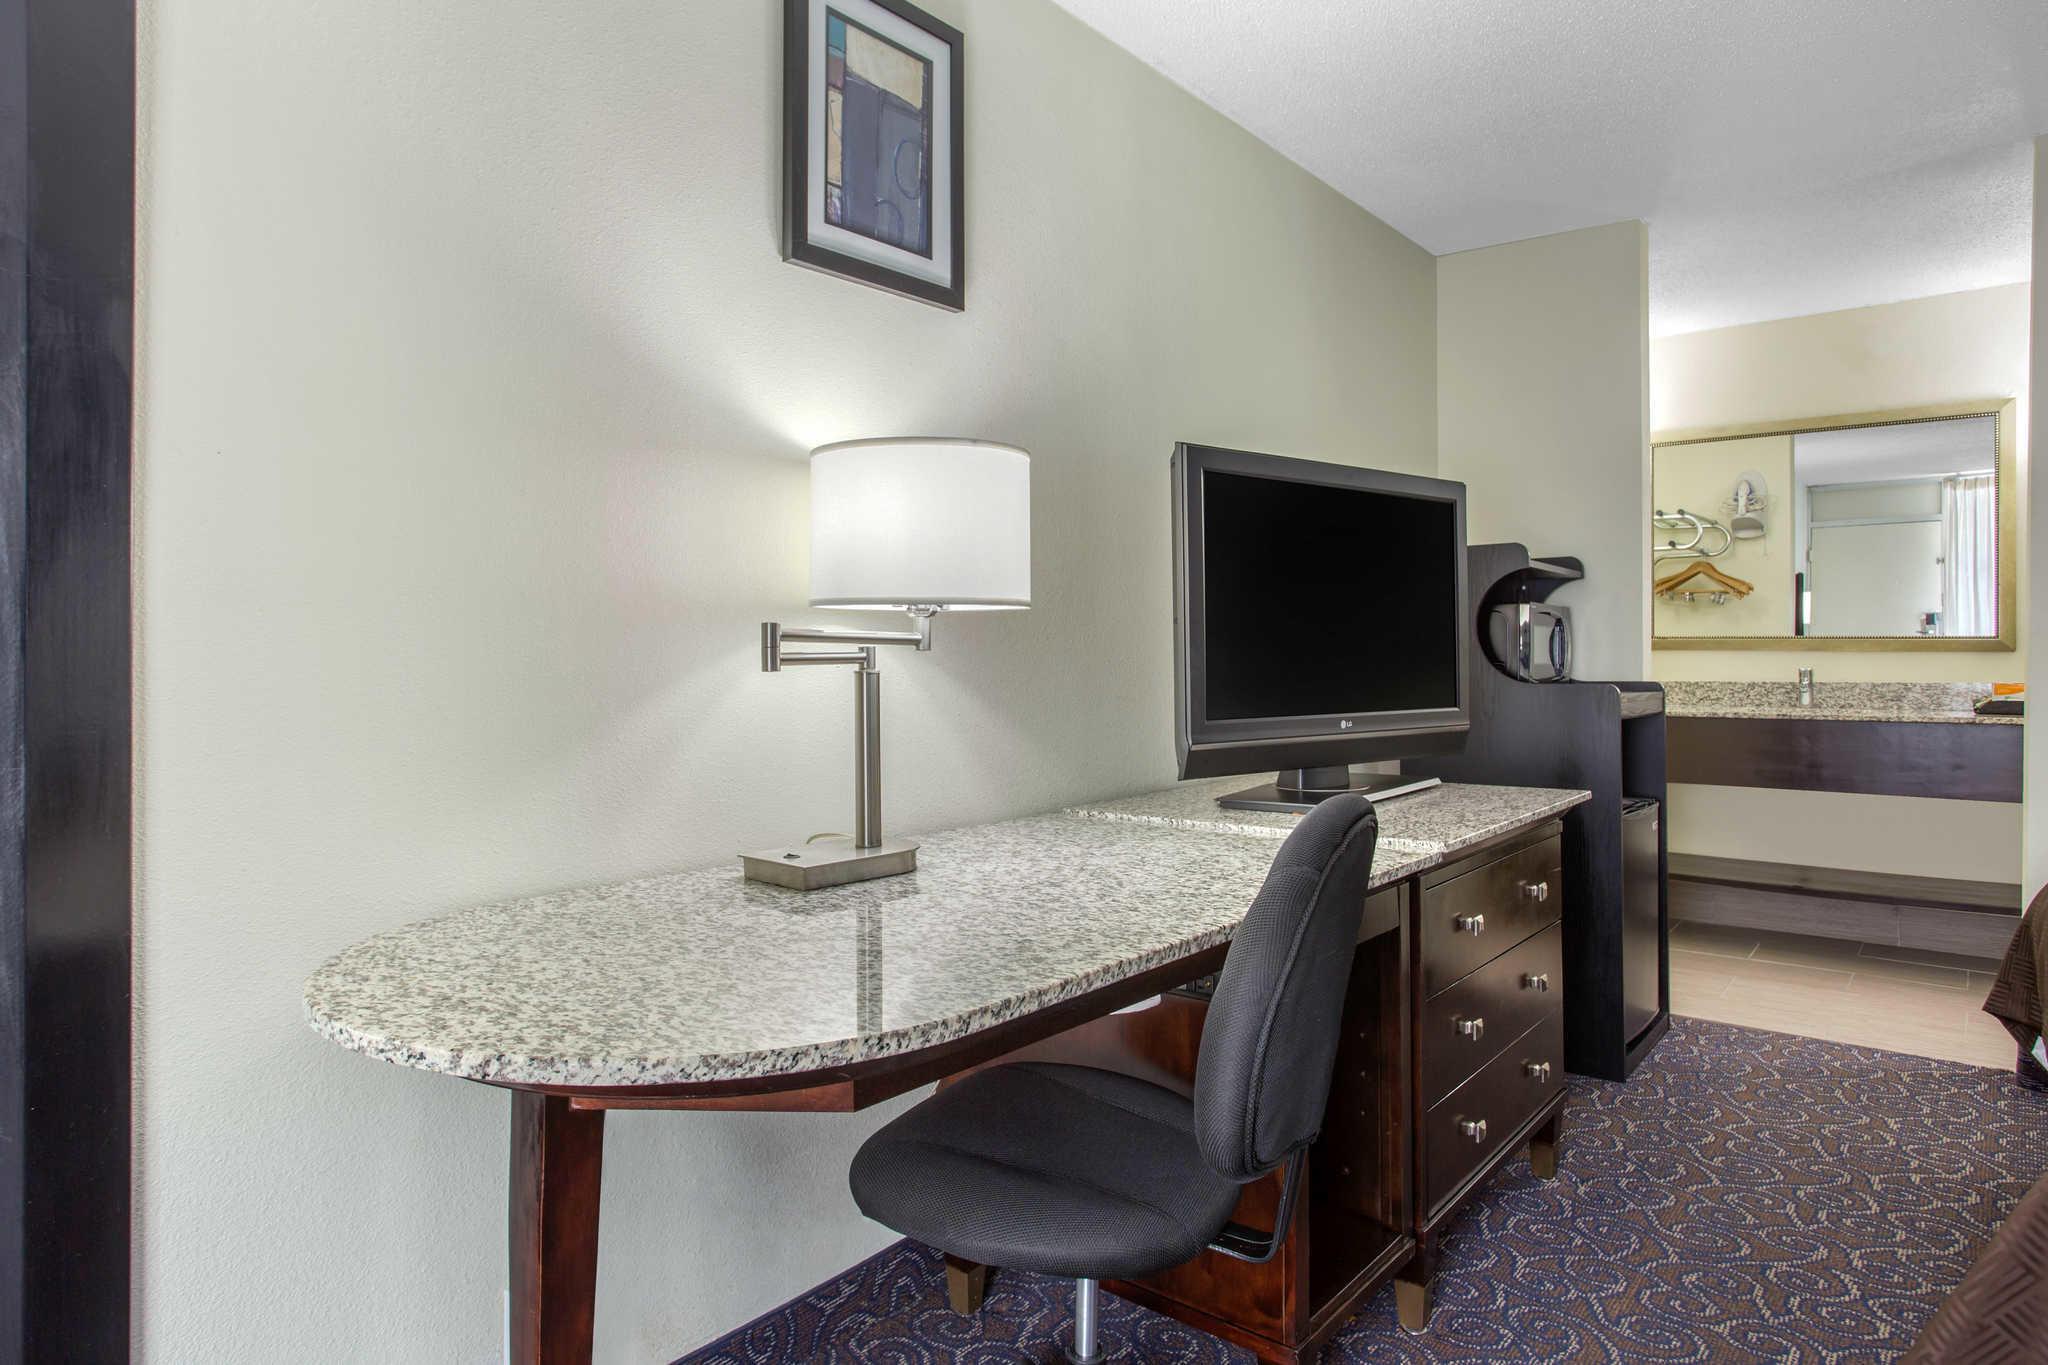 Clarion Inn & Suites image 11